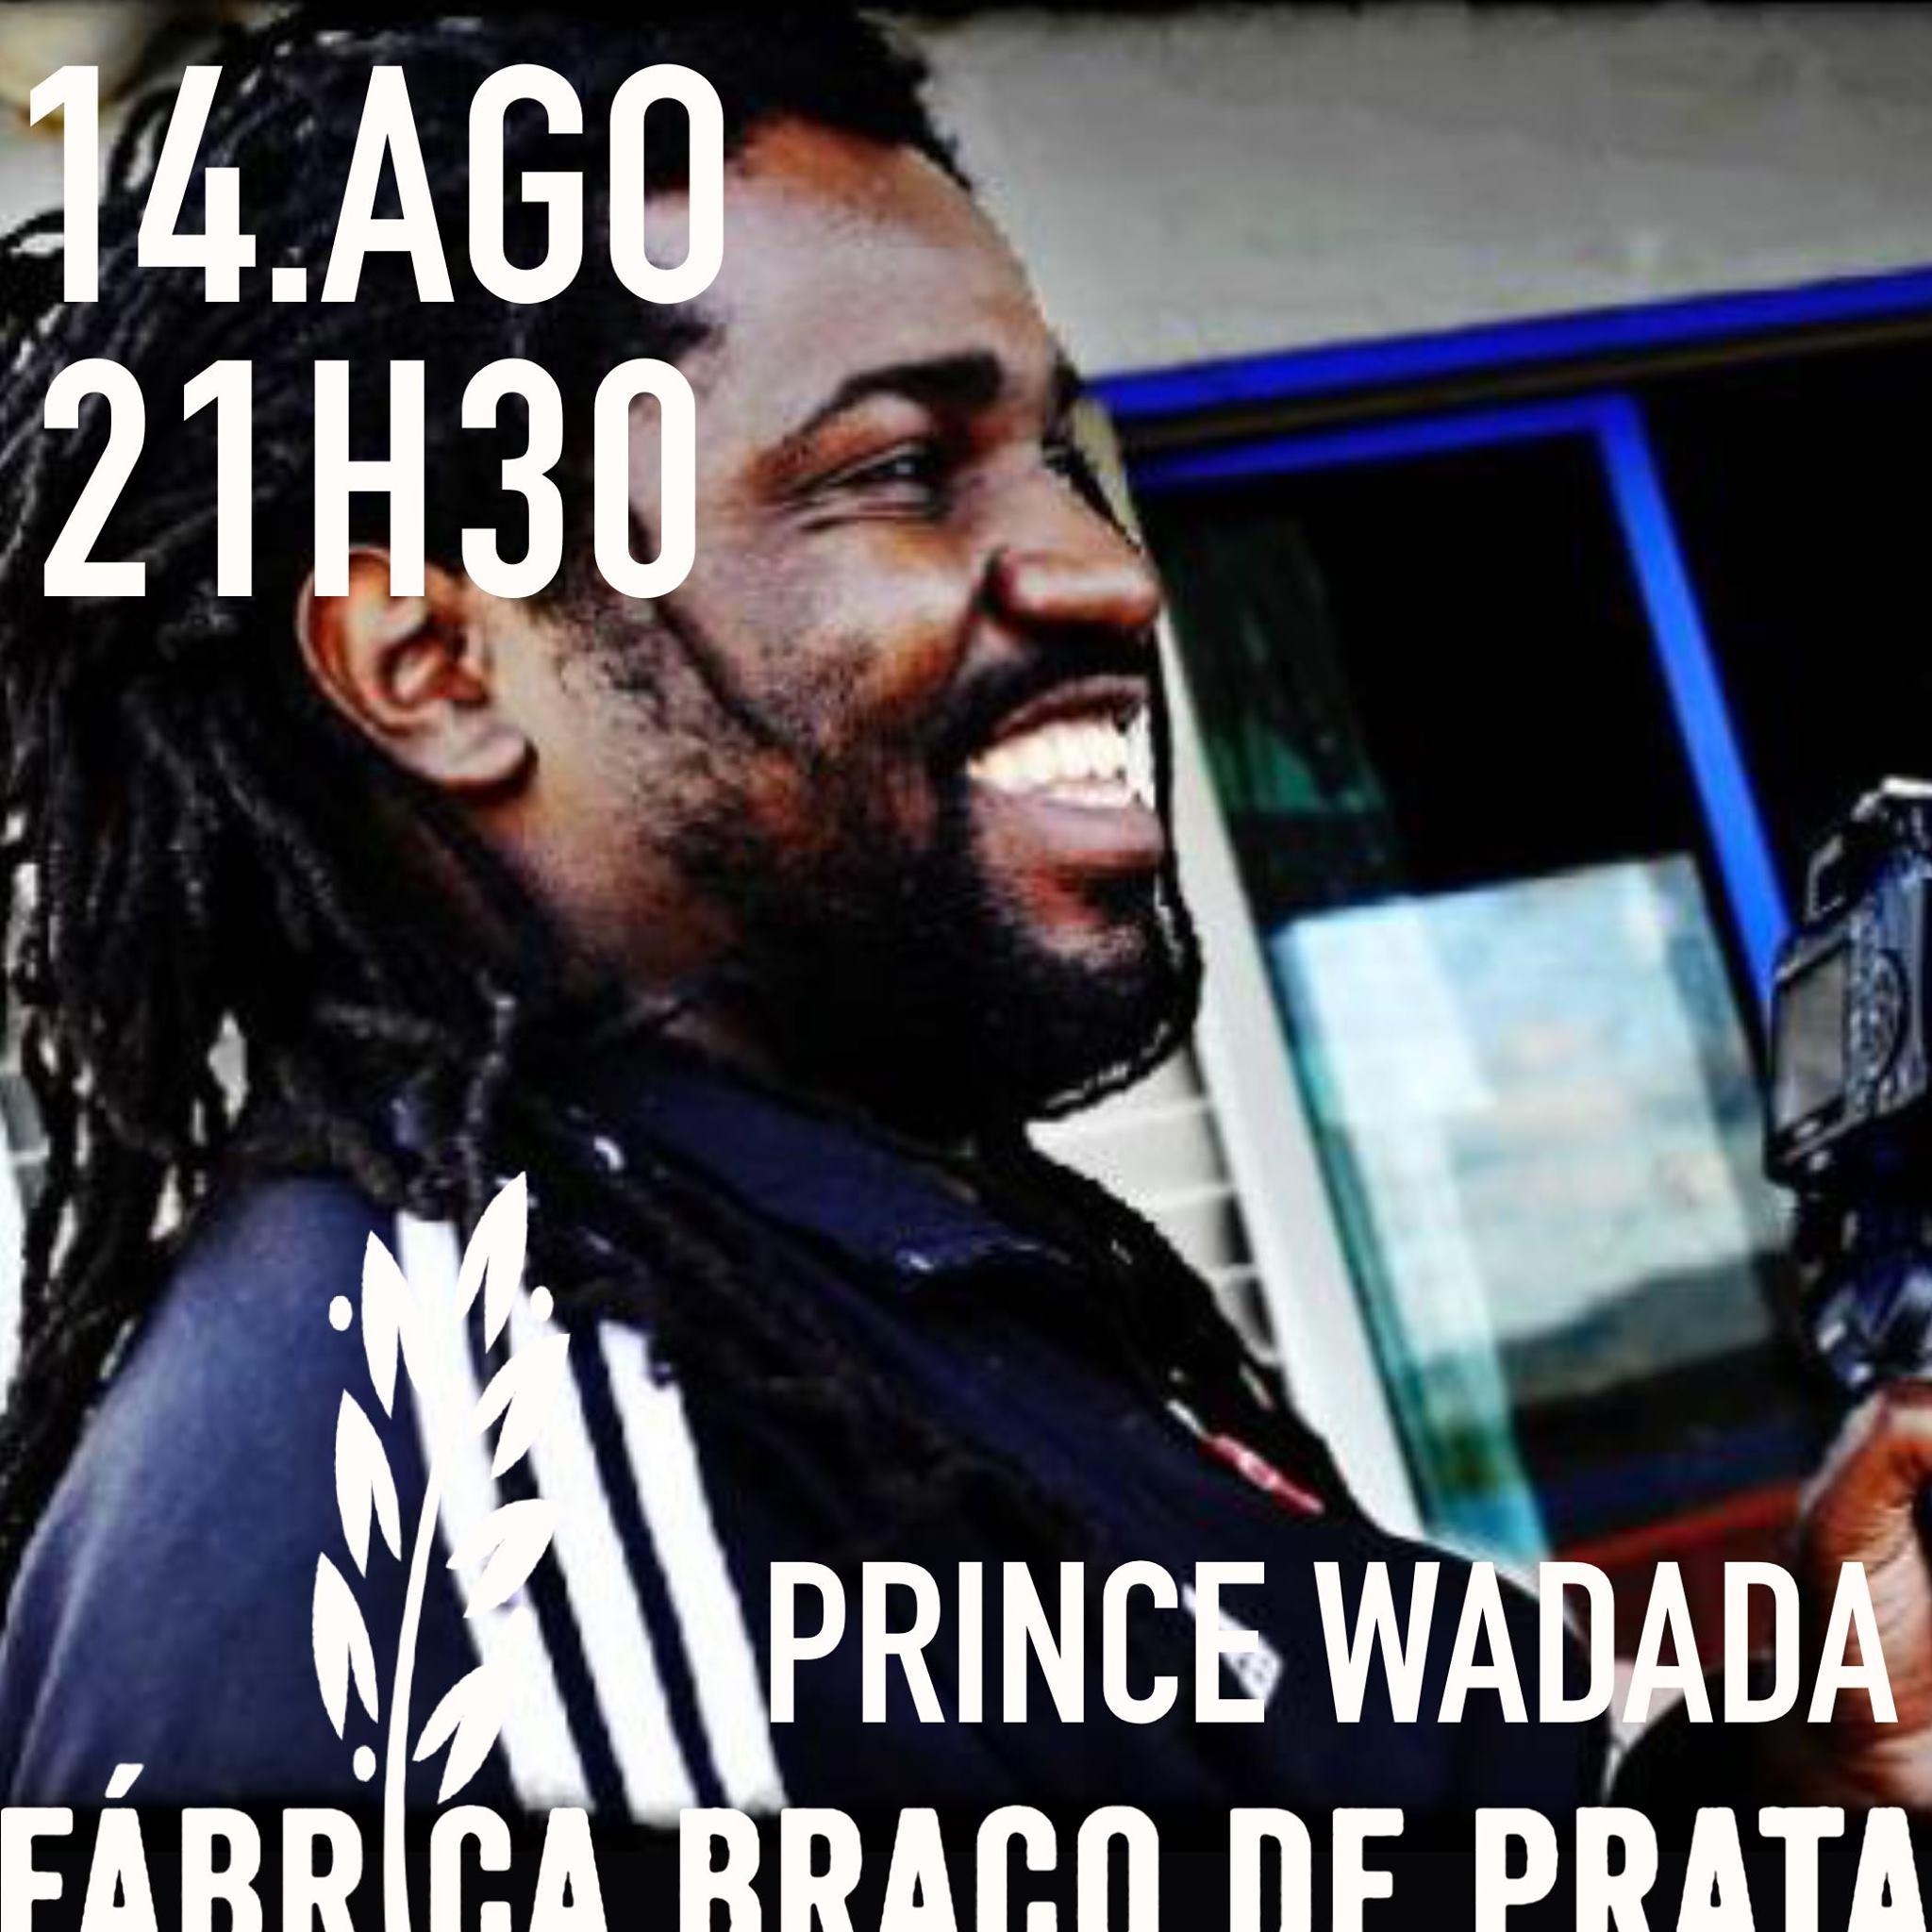 Prince Wadada